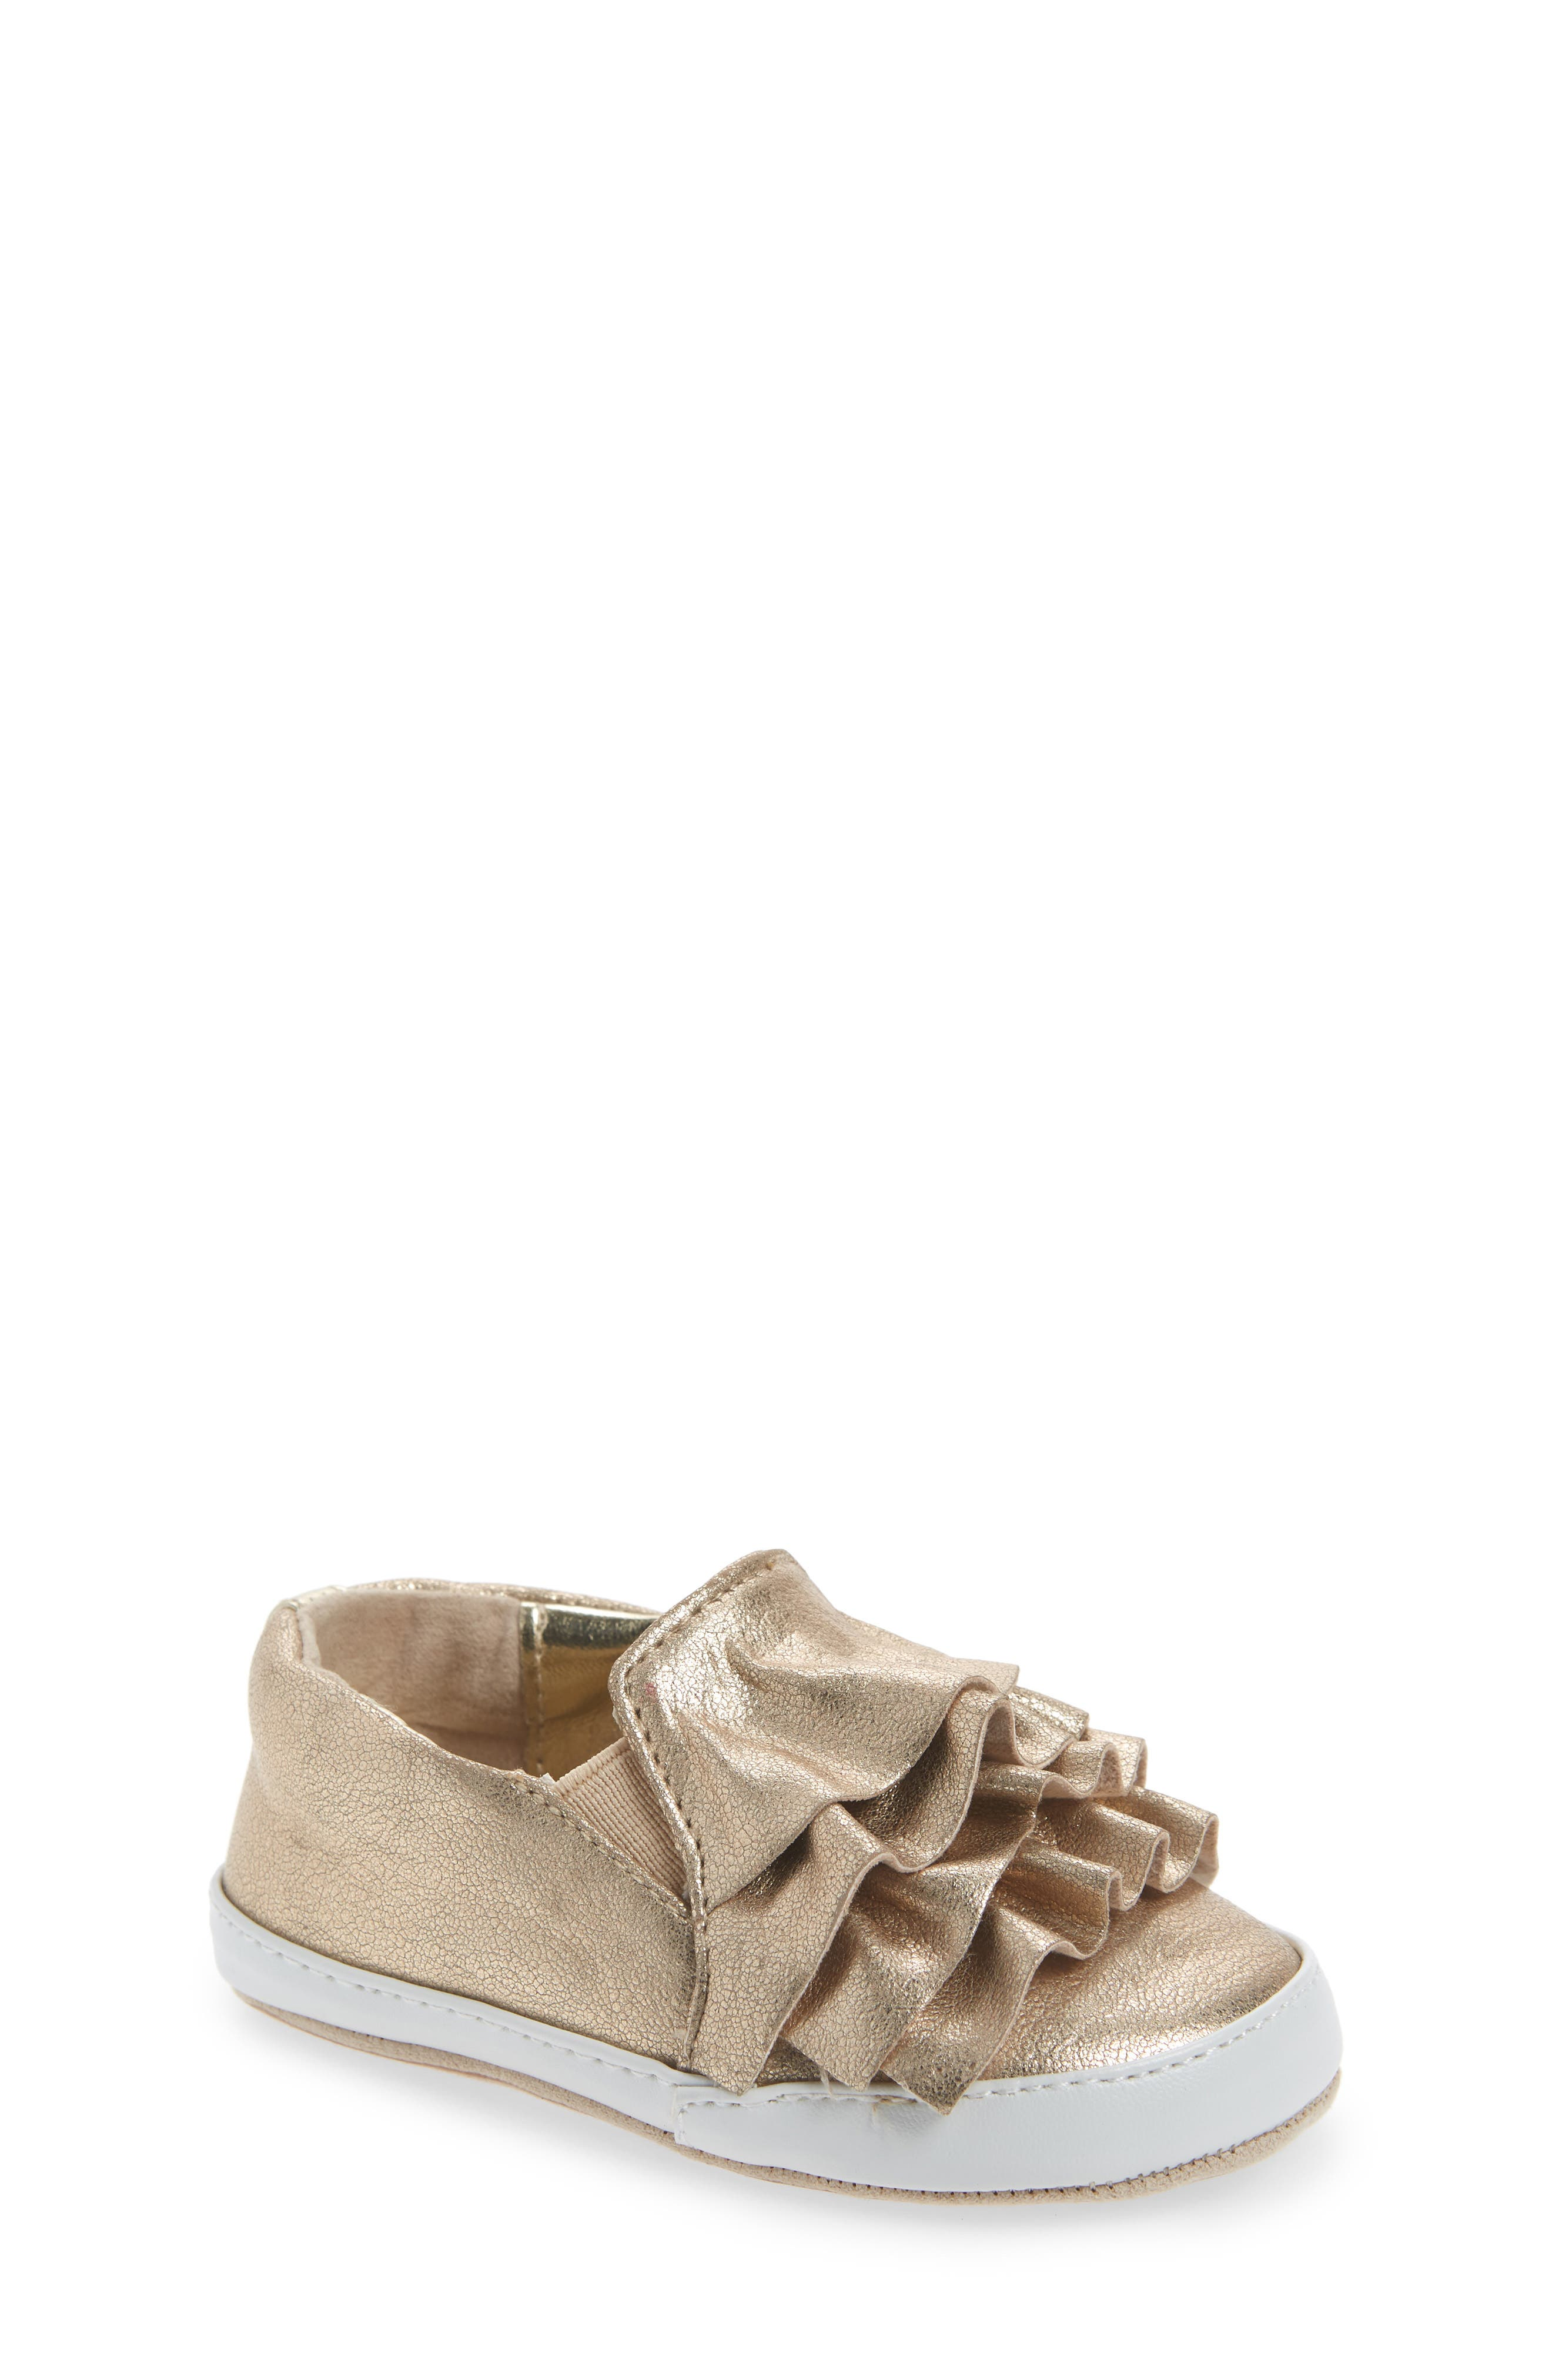 Kenneth Cole New York Ruffle Metallic Kam Slip-On Sneaker (Baby)